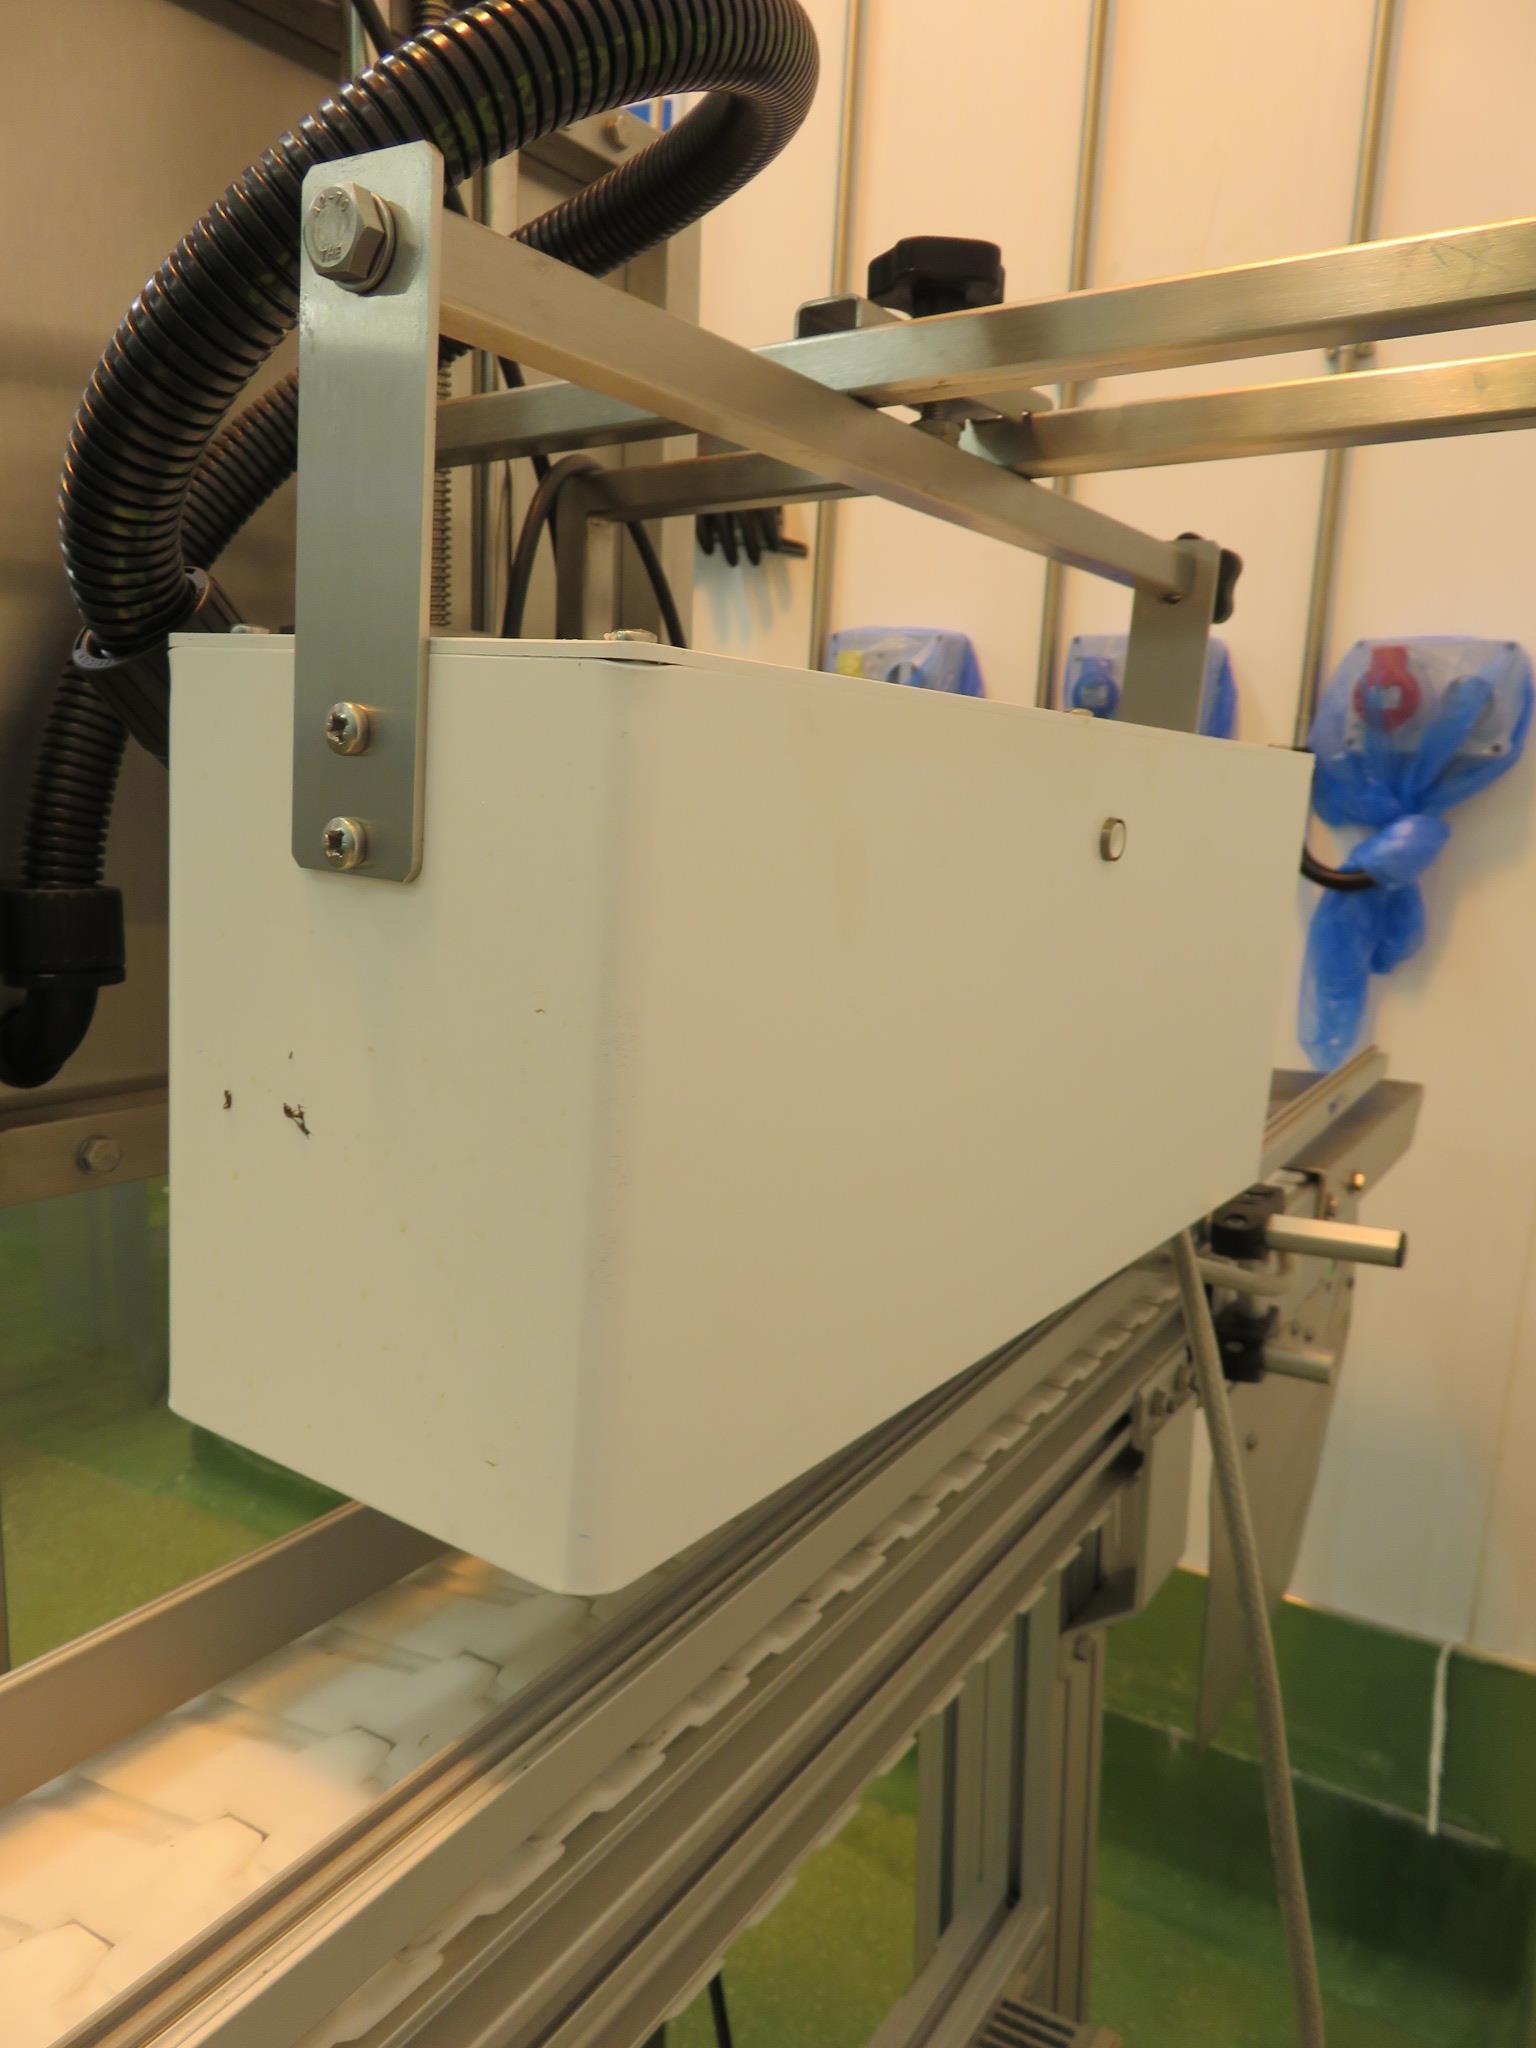 HF Technology induction sealing machine model MICS 2. LO £60. - Image 3 of 5